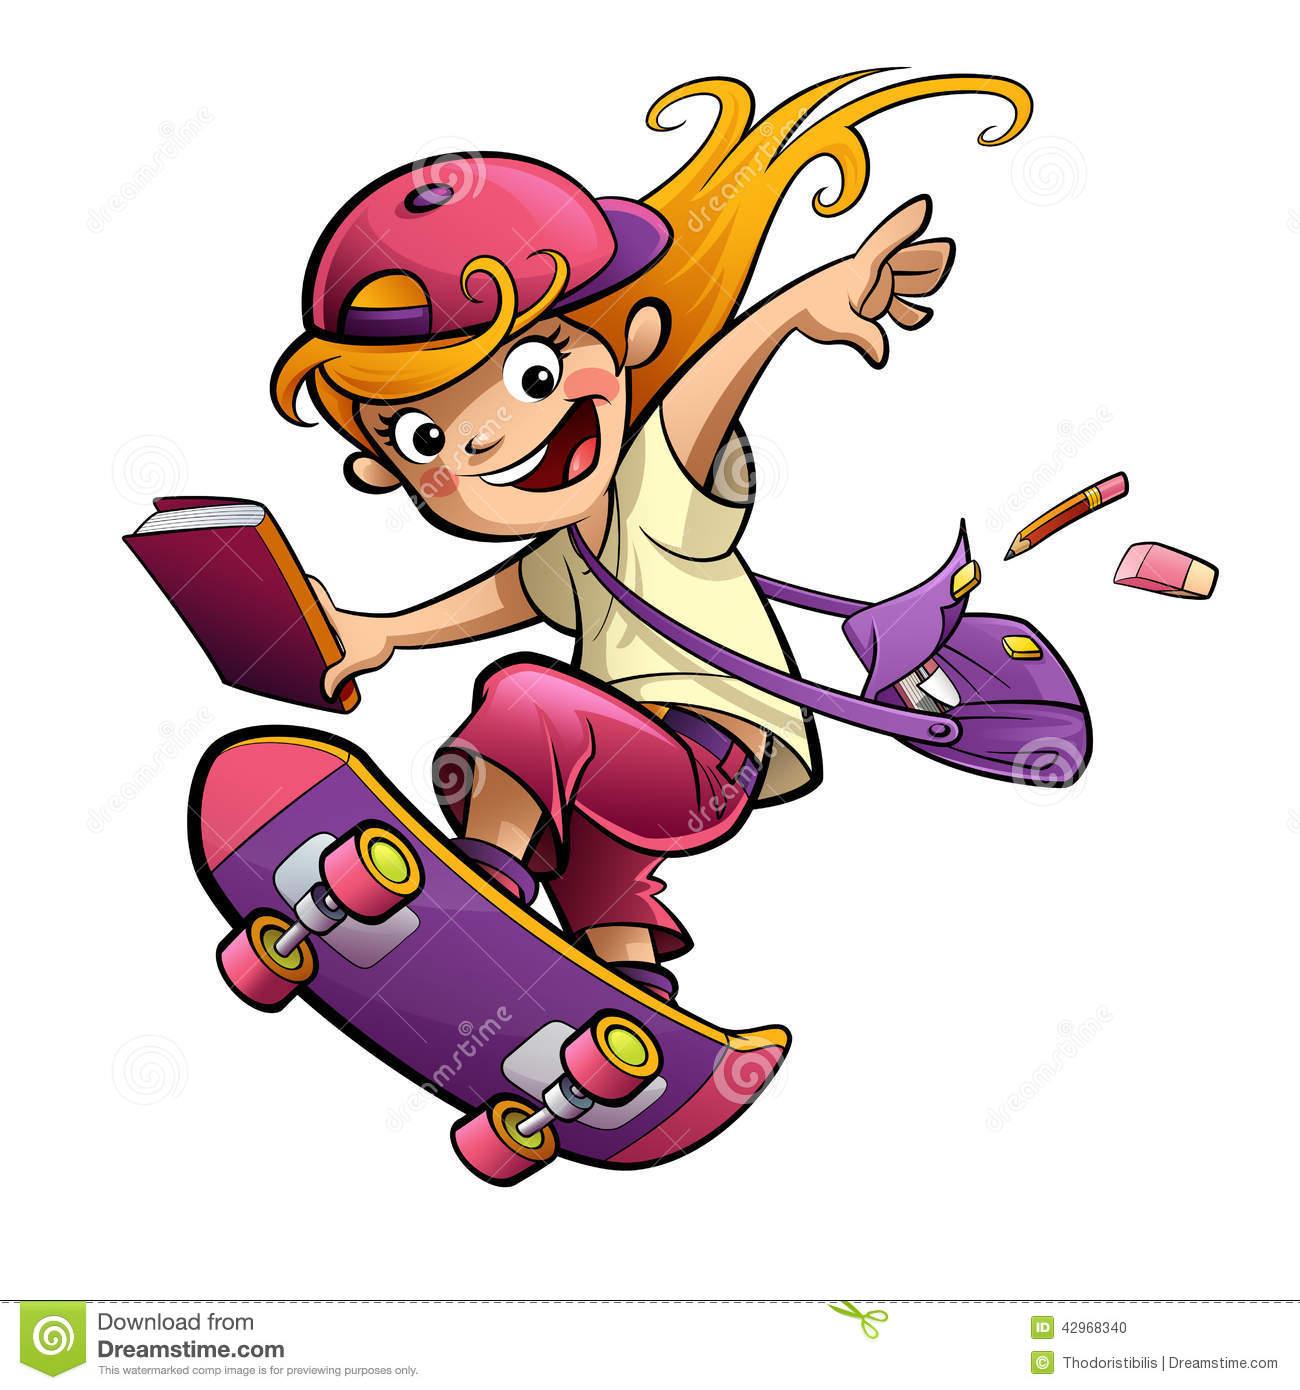 549 Skateboard free clipart.